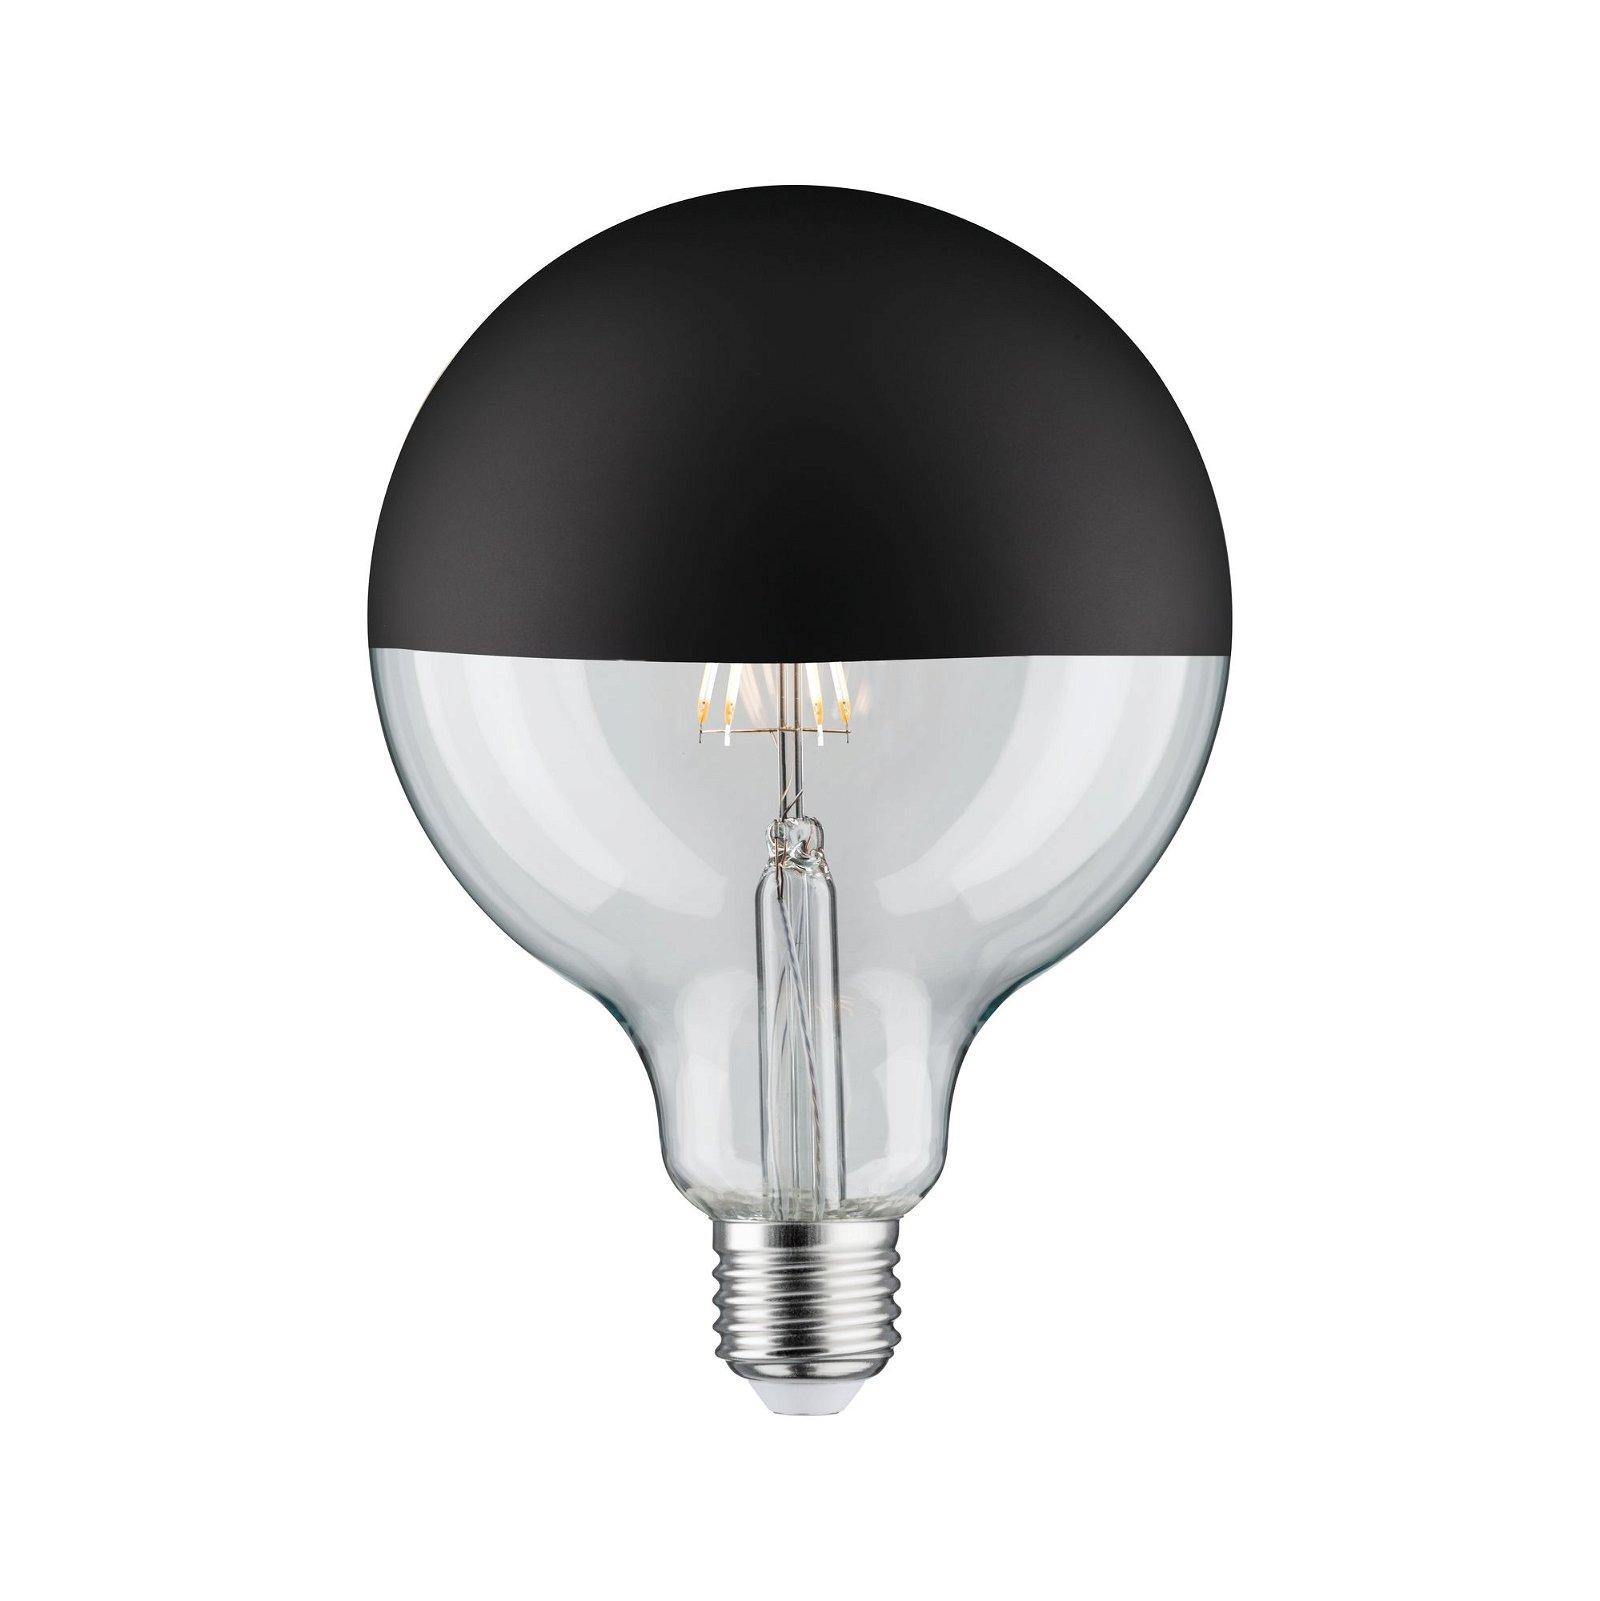 Modern Classic Edition LED Globe Kopfspiegel E27 230V 600lm 6,5W 2700K Kopfspiegel Schwarz matt